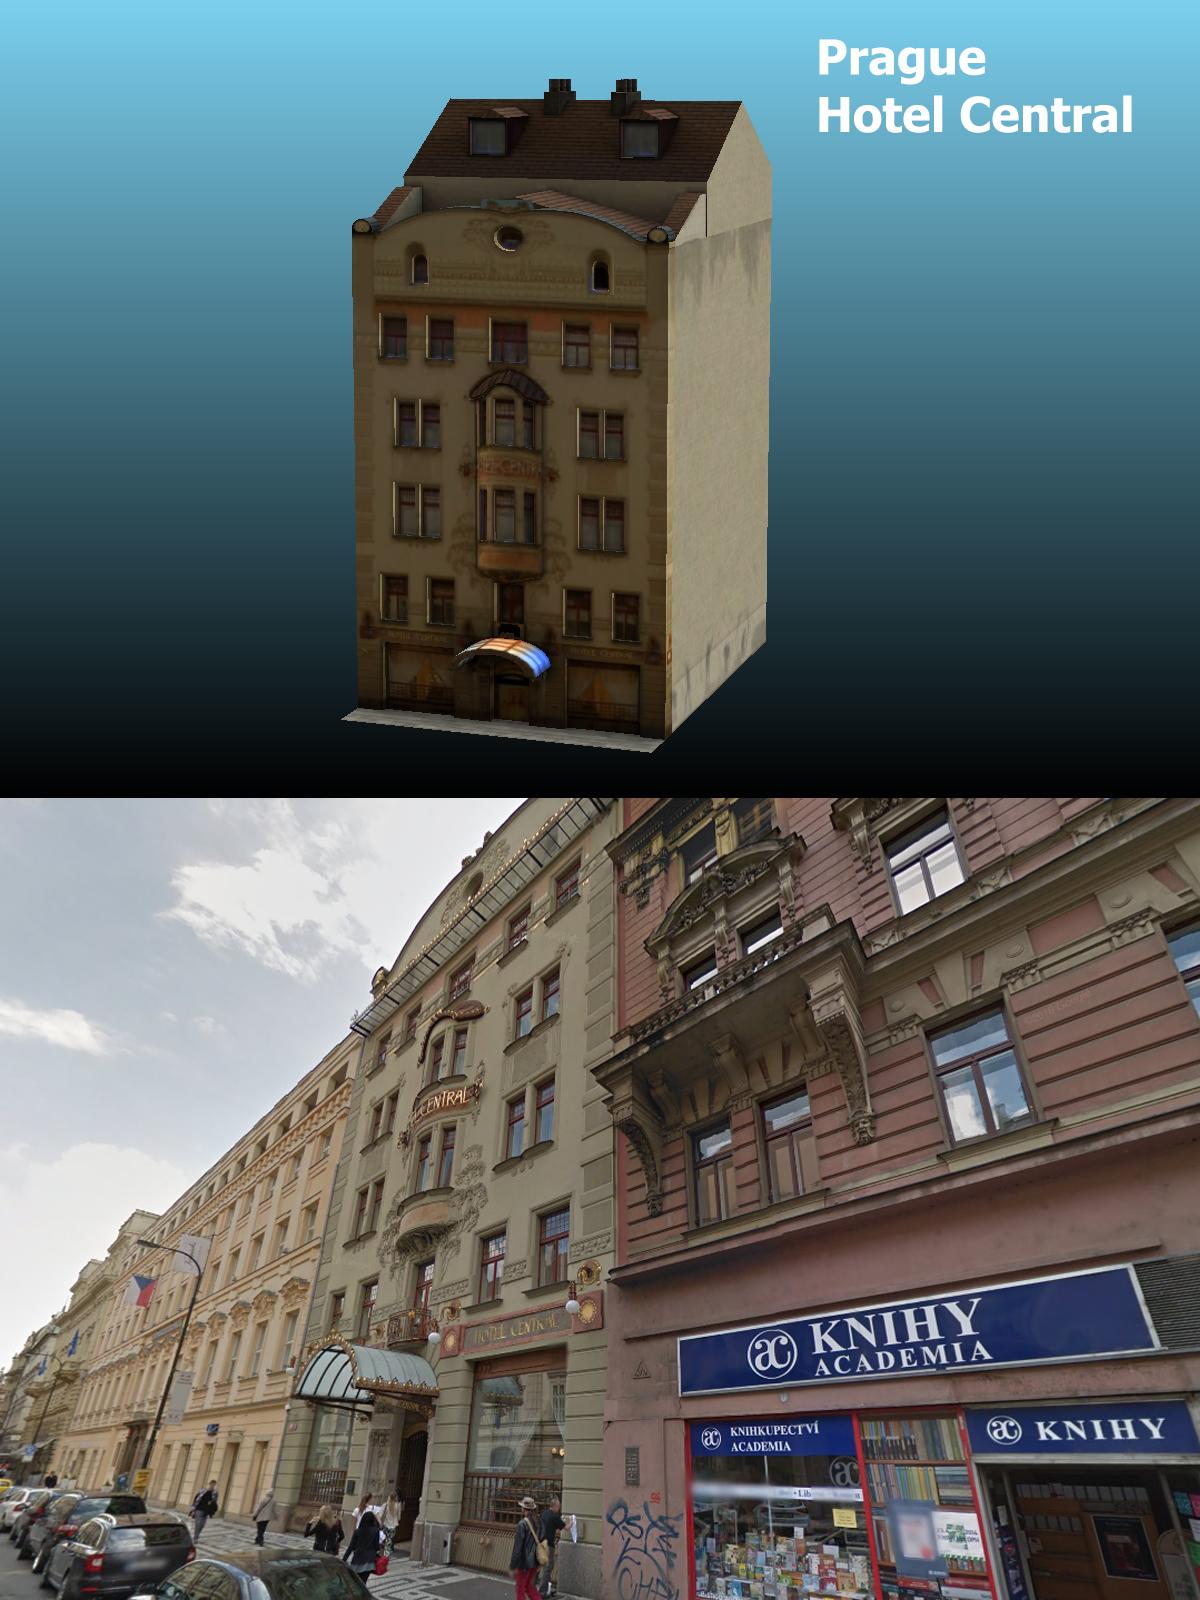 HotelCentral.jpg